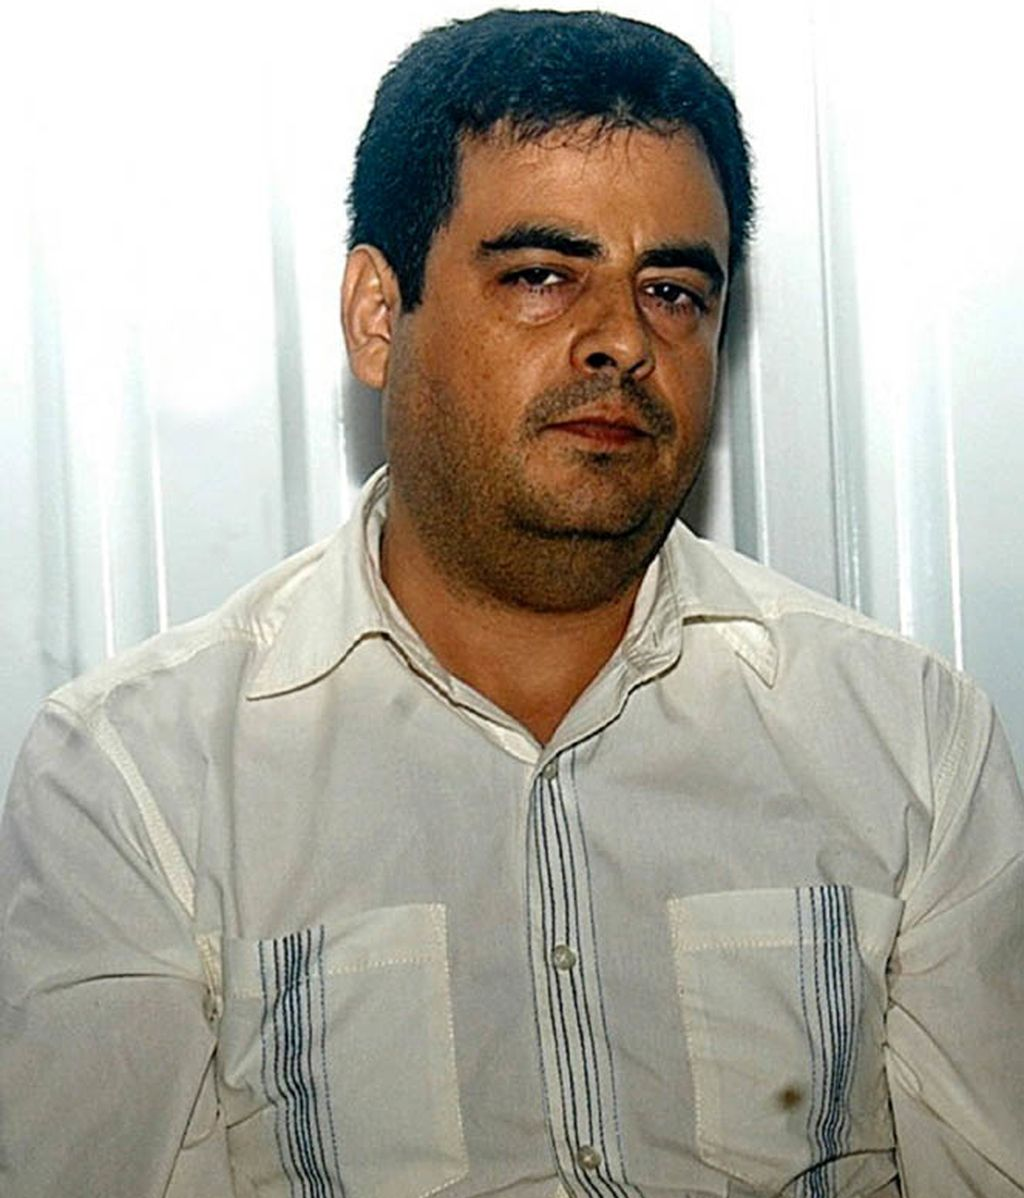 Carlos Beltrán Leyva